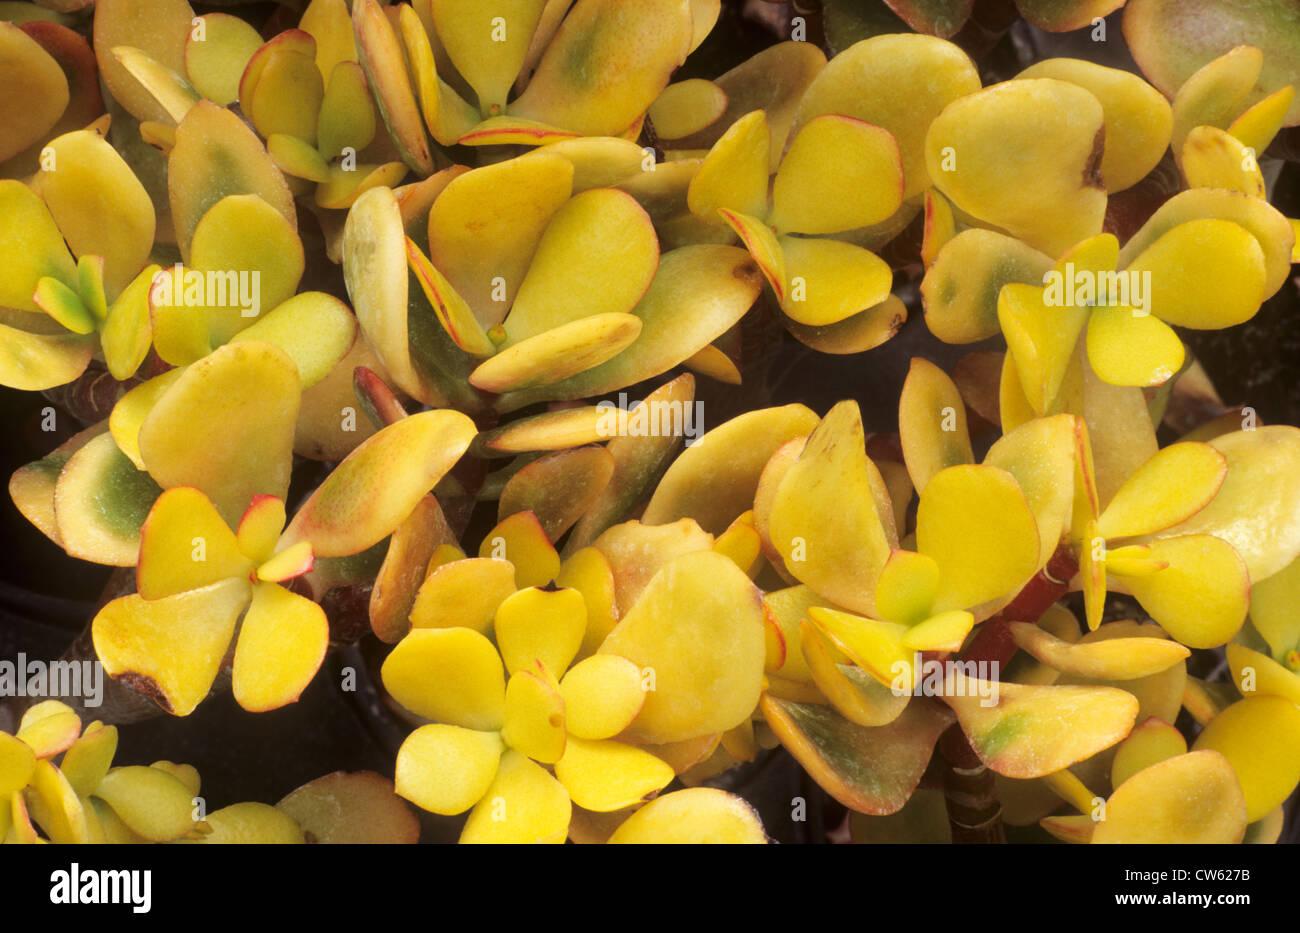 Crassula ovata 'Hummel's Sunset', syn. C. argentea, succulent, succulents yellow foliage leaf leaves garden plant Stock Photo